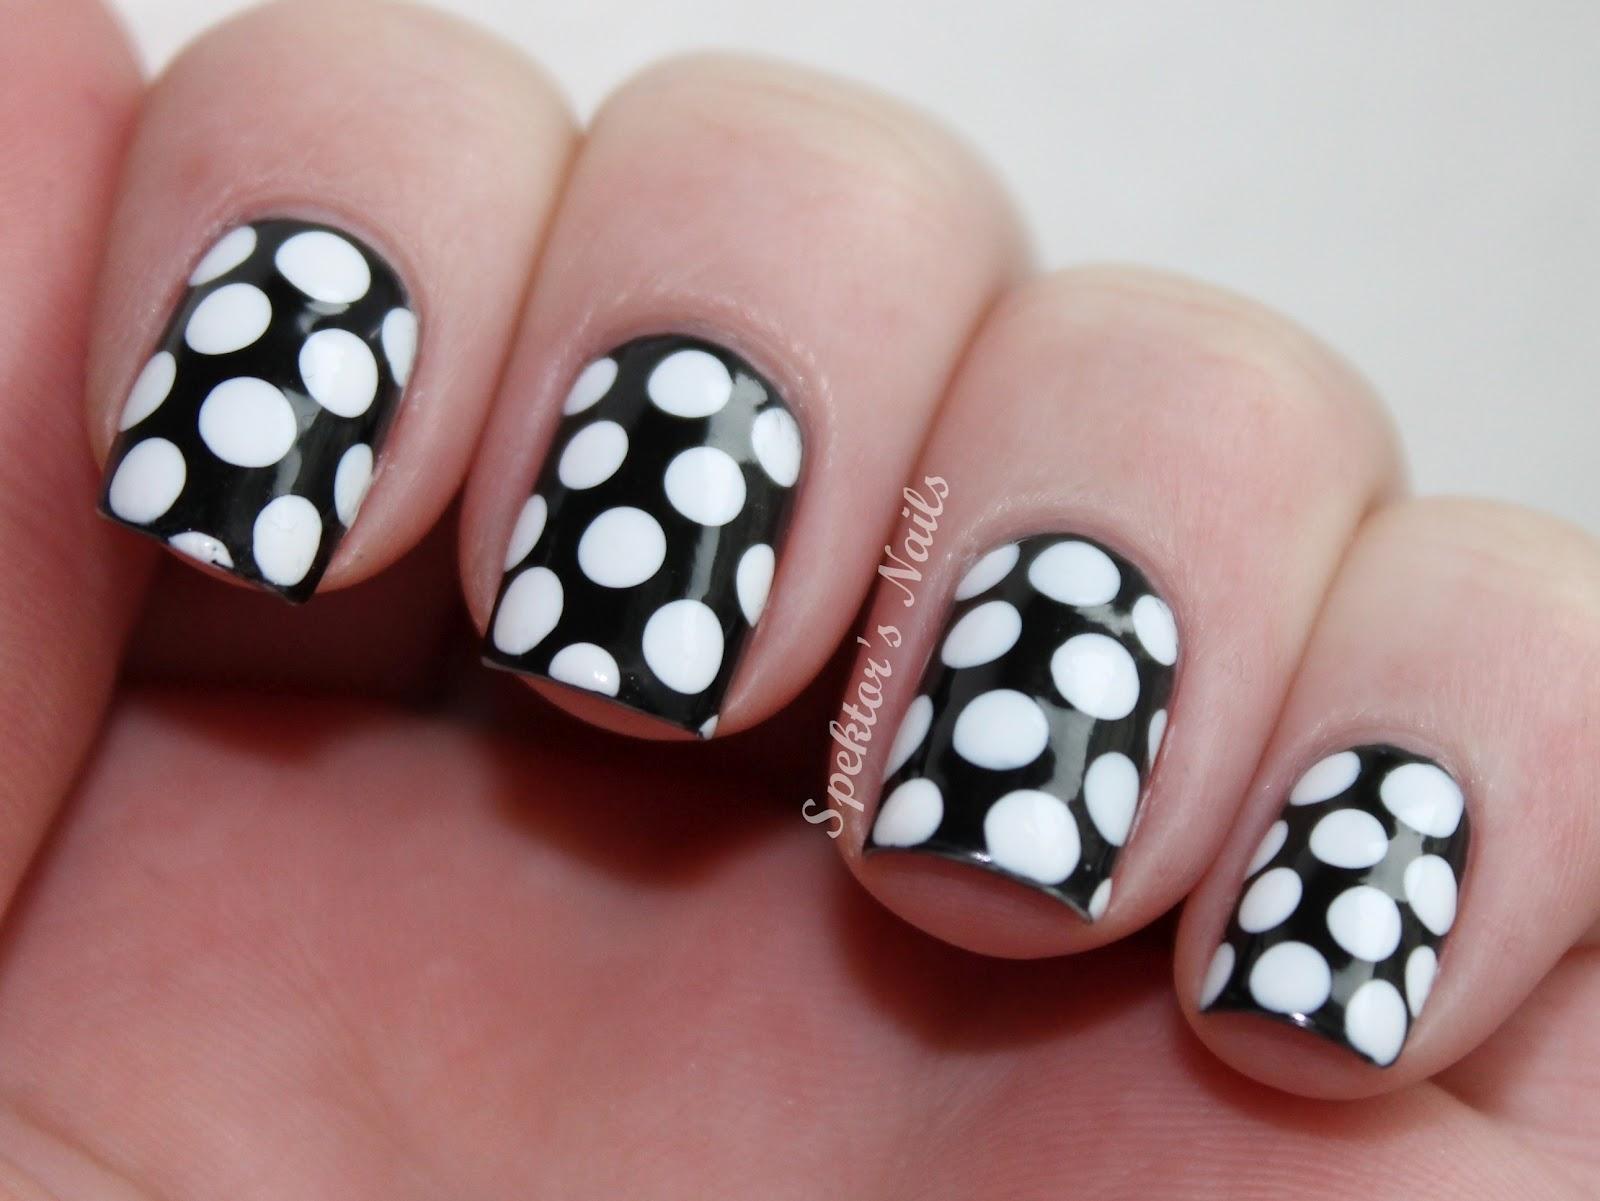 White stiletto nail designs car tuning - Black And White Polka Dot Nails